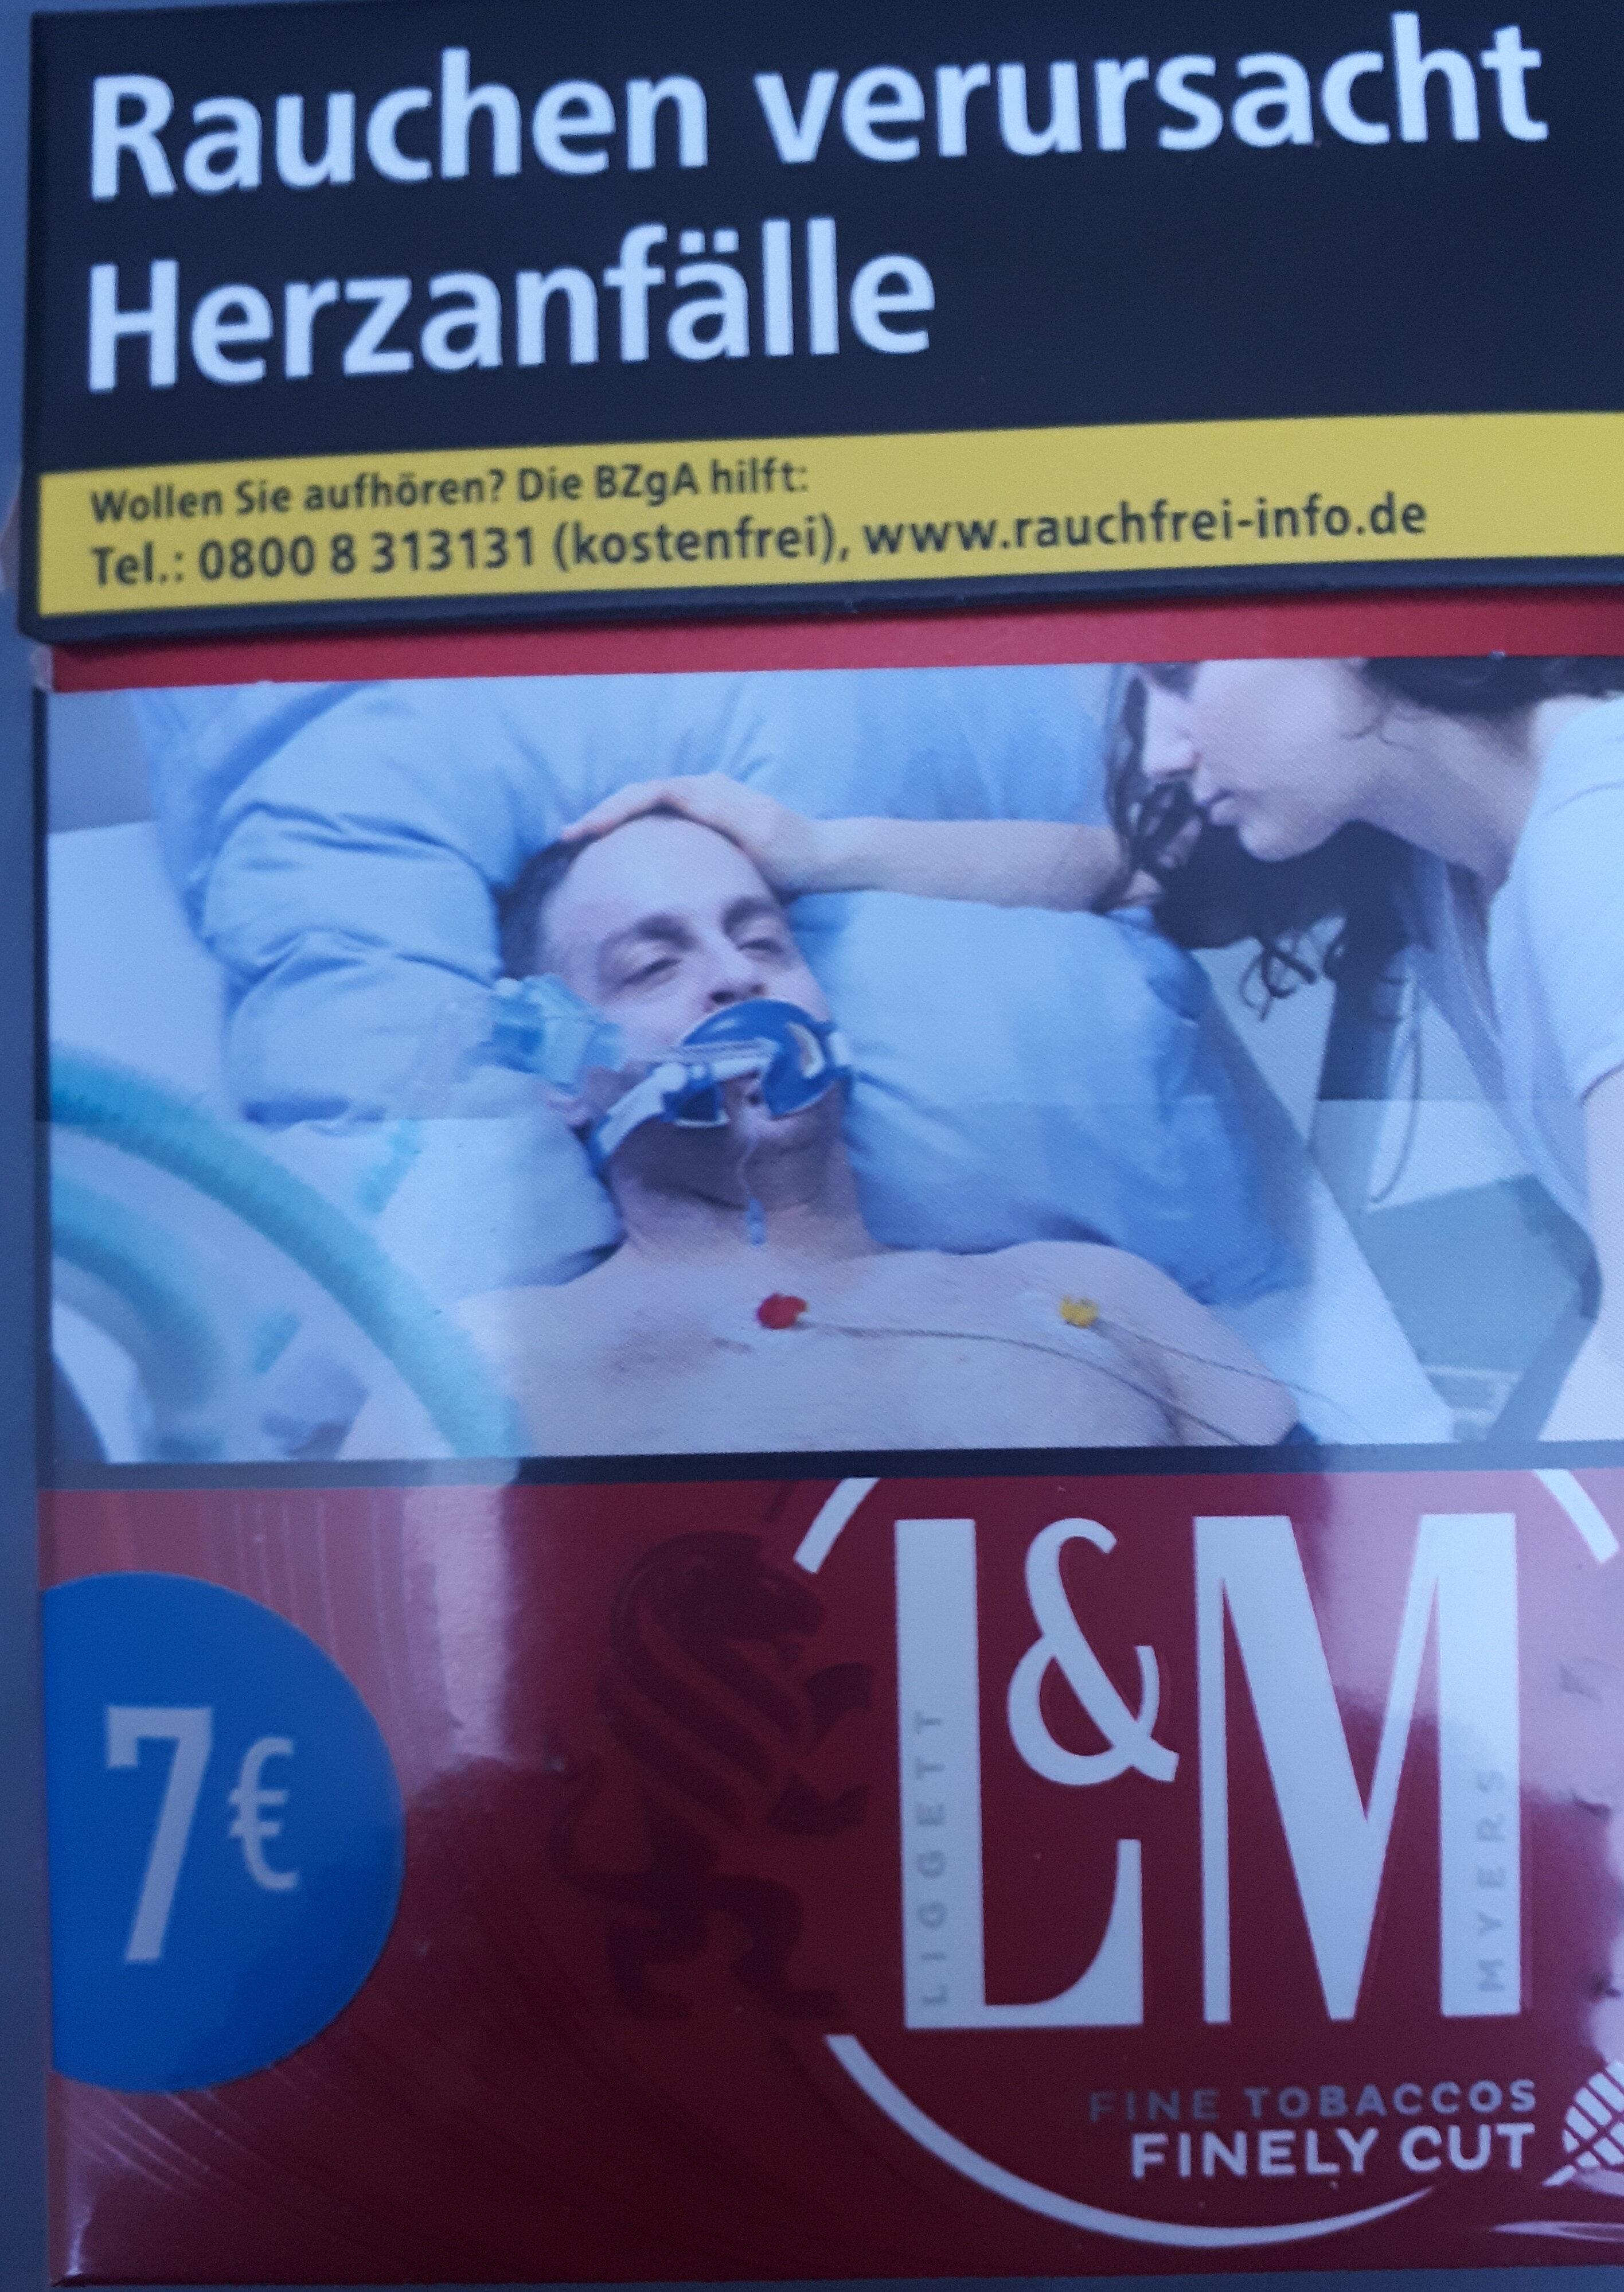 L&M Fine Tabaccos Finely cut - Product - de